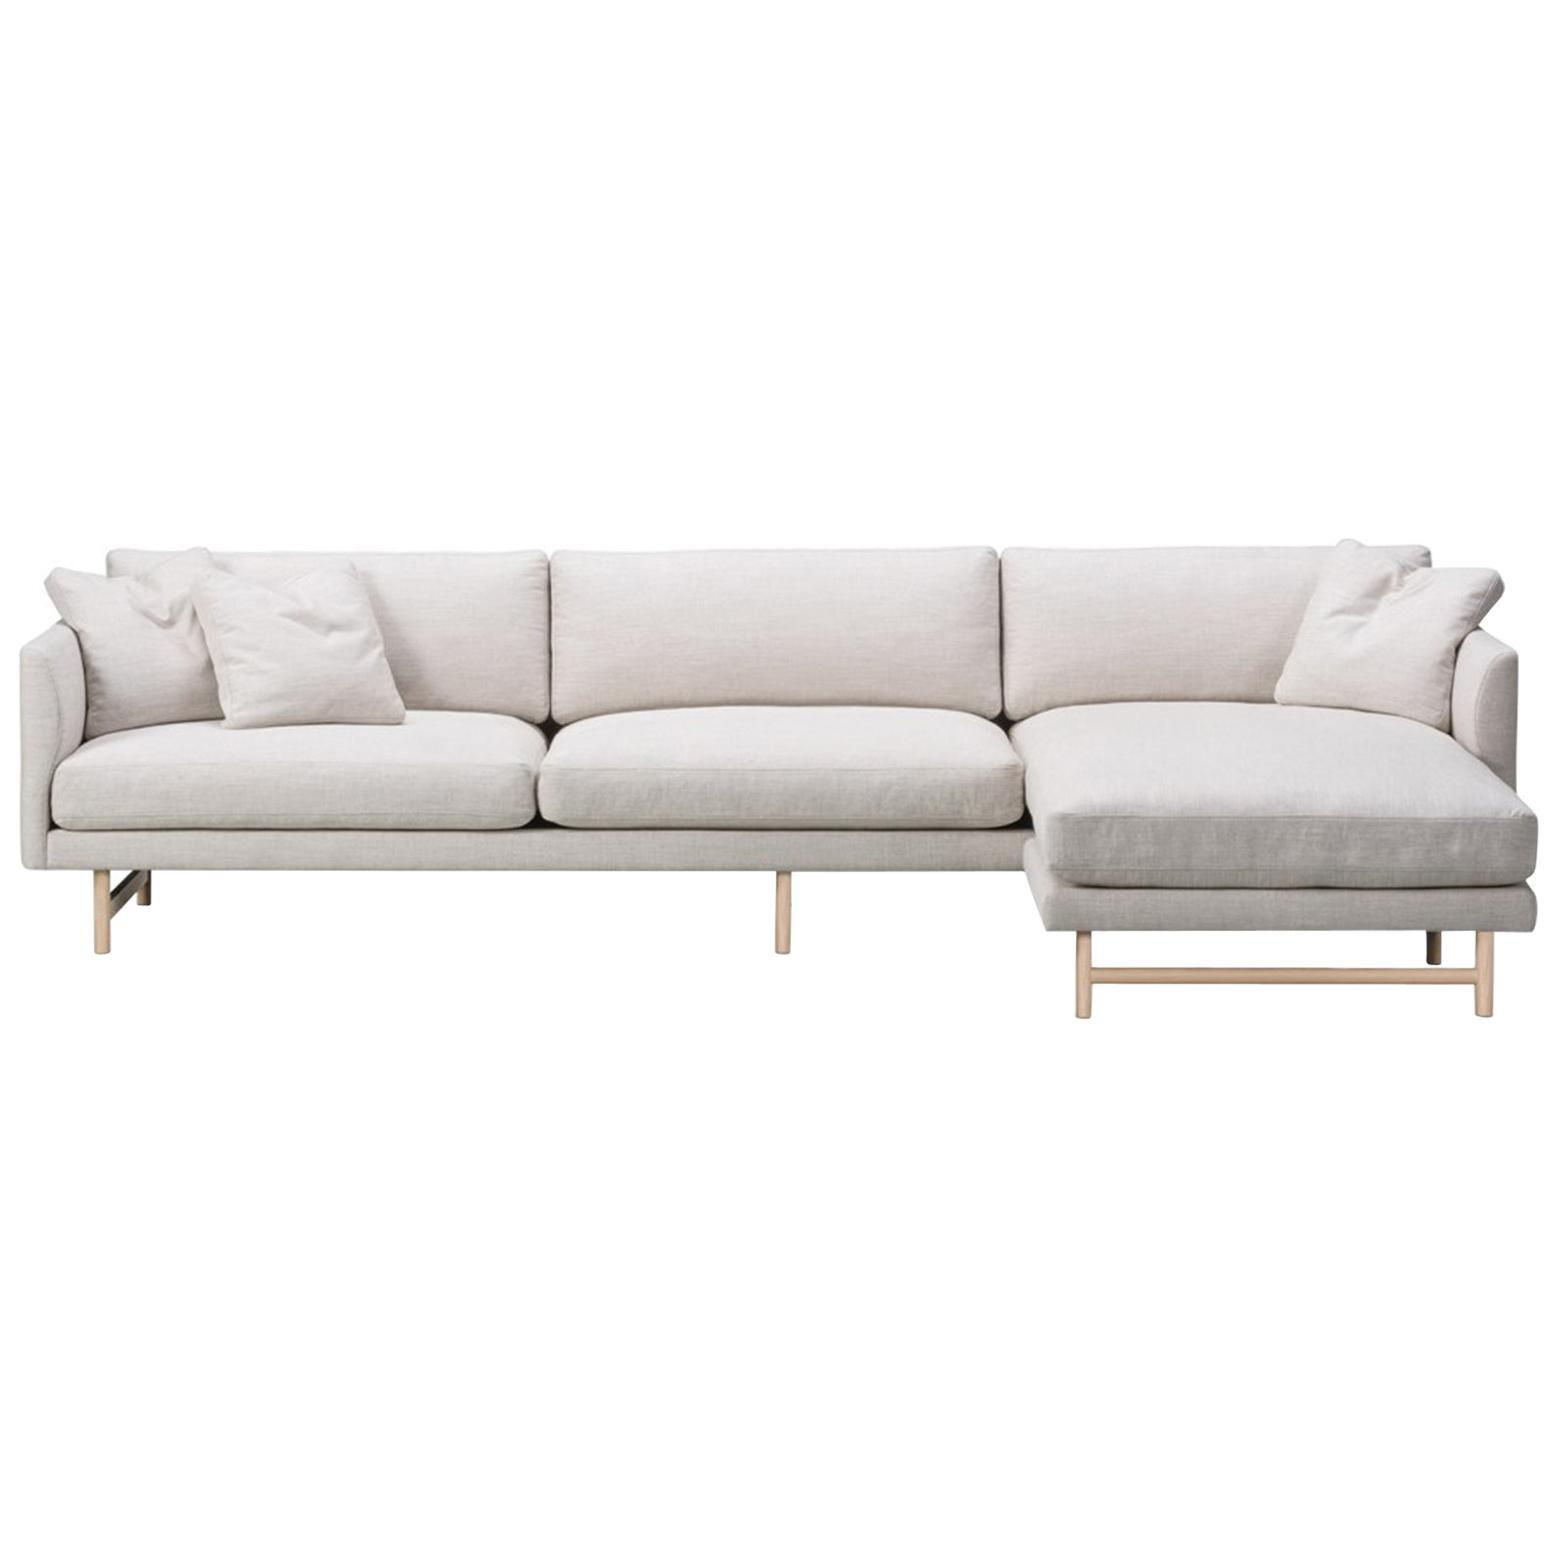 Hugo Passos Calmo Sofa 95, 3-Seater, Chaise, Wood Base